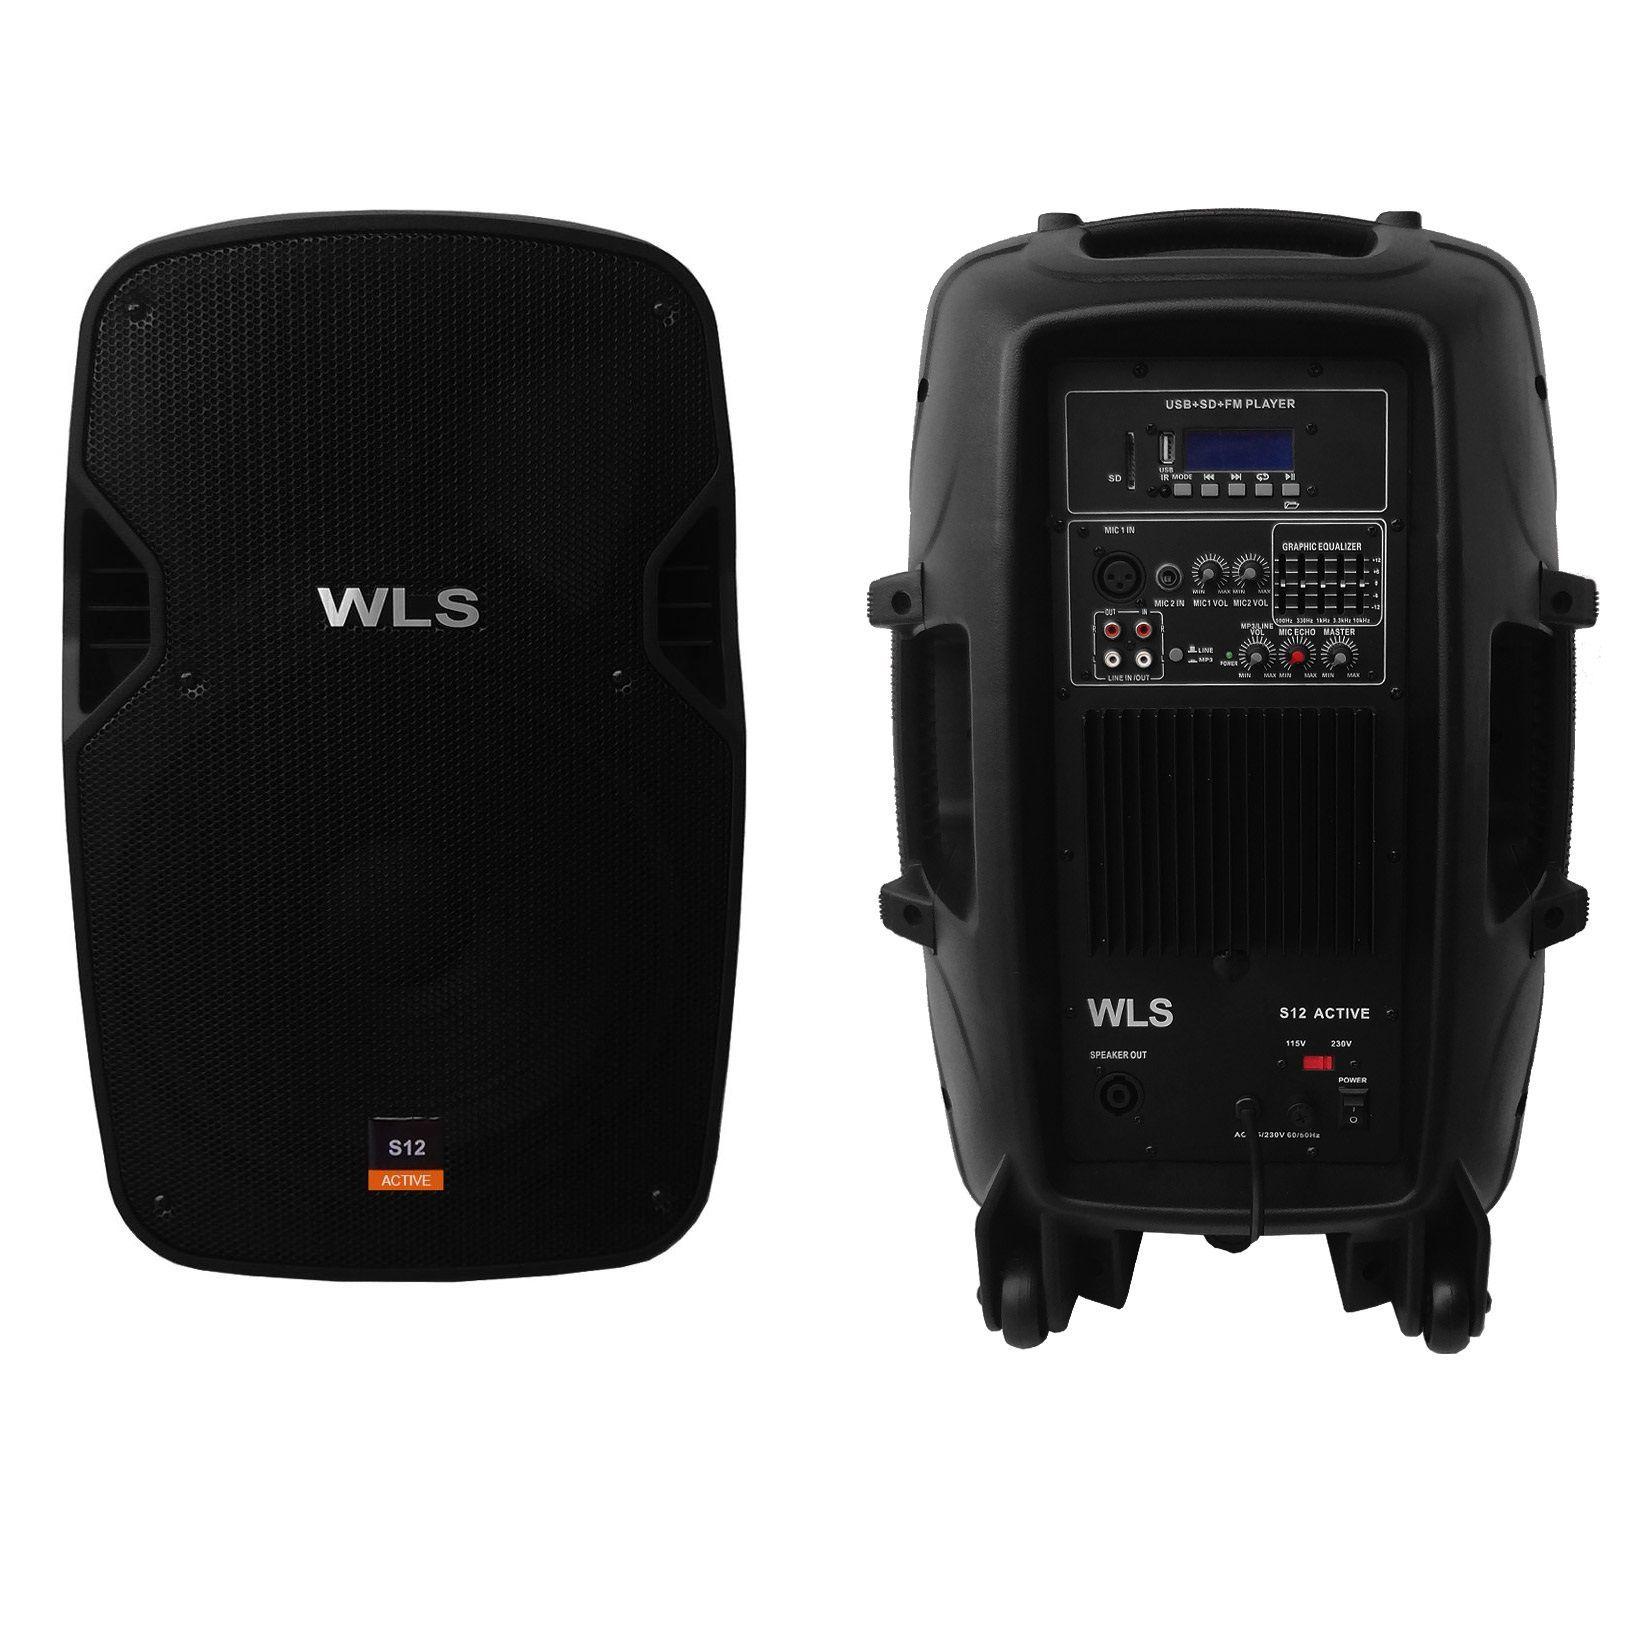 Kit Caixa De Som Ativa Passiva Wls S12 Bluetooth 430w Rms + Cabo